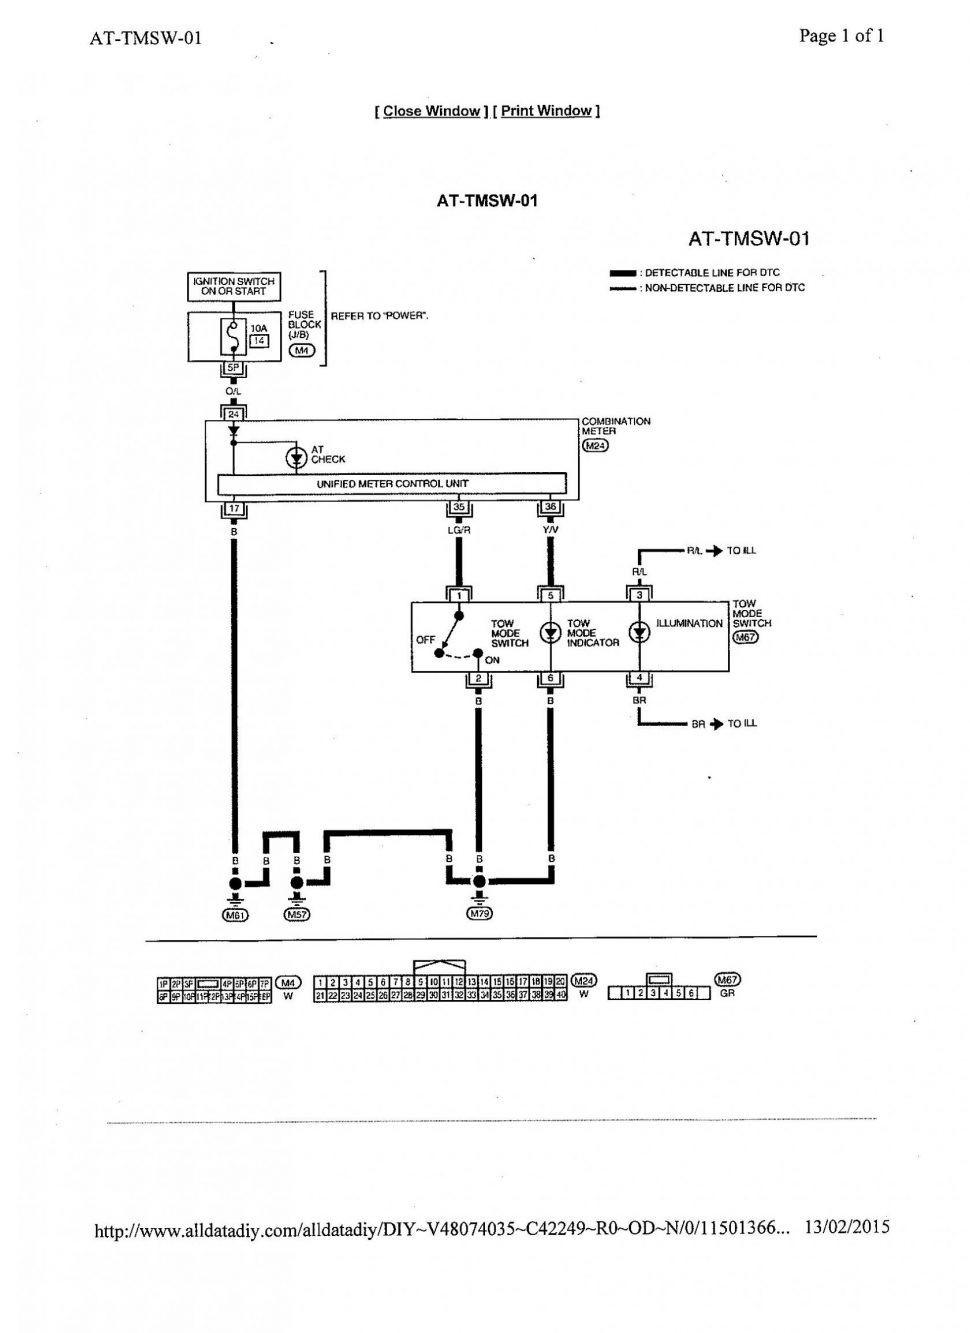 Basic Electrical Wiring Diagram Awesome Electrical Wiring Repair Electrical Switch Wiring and Typical